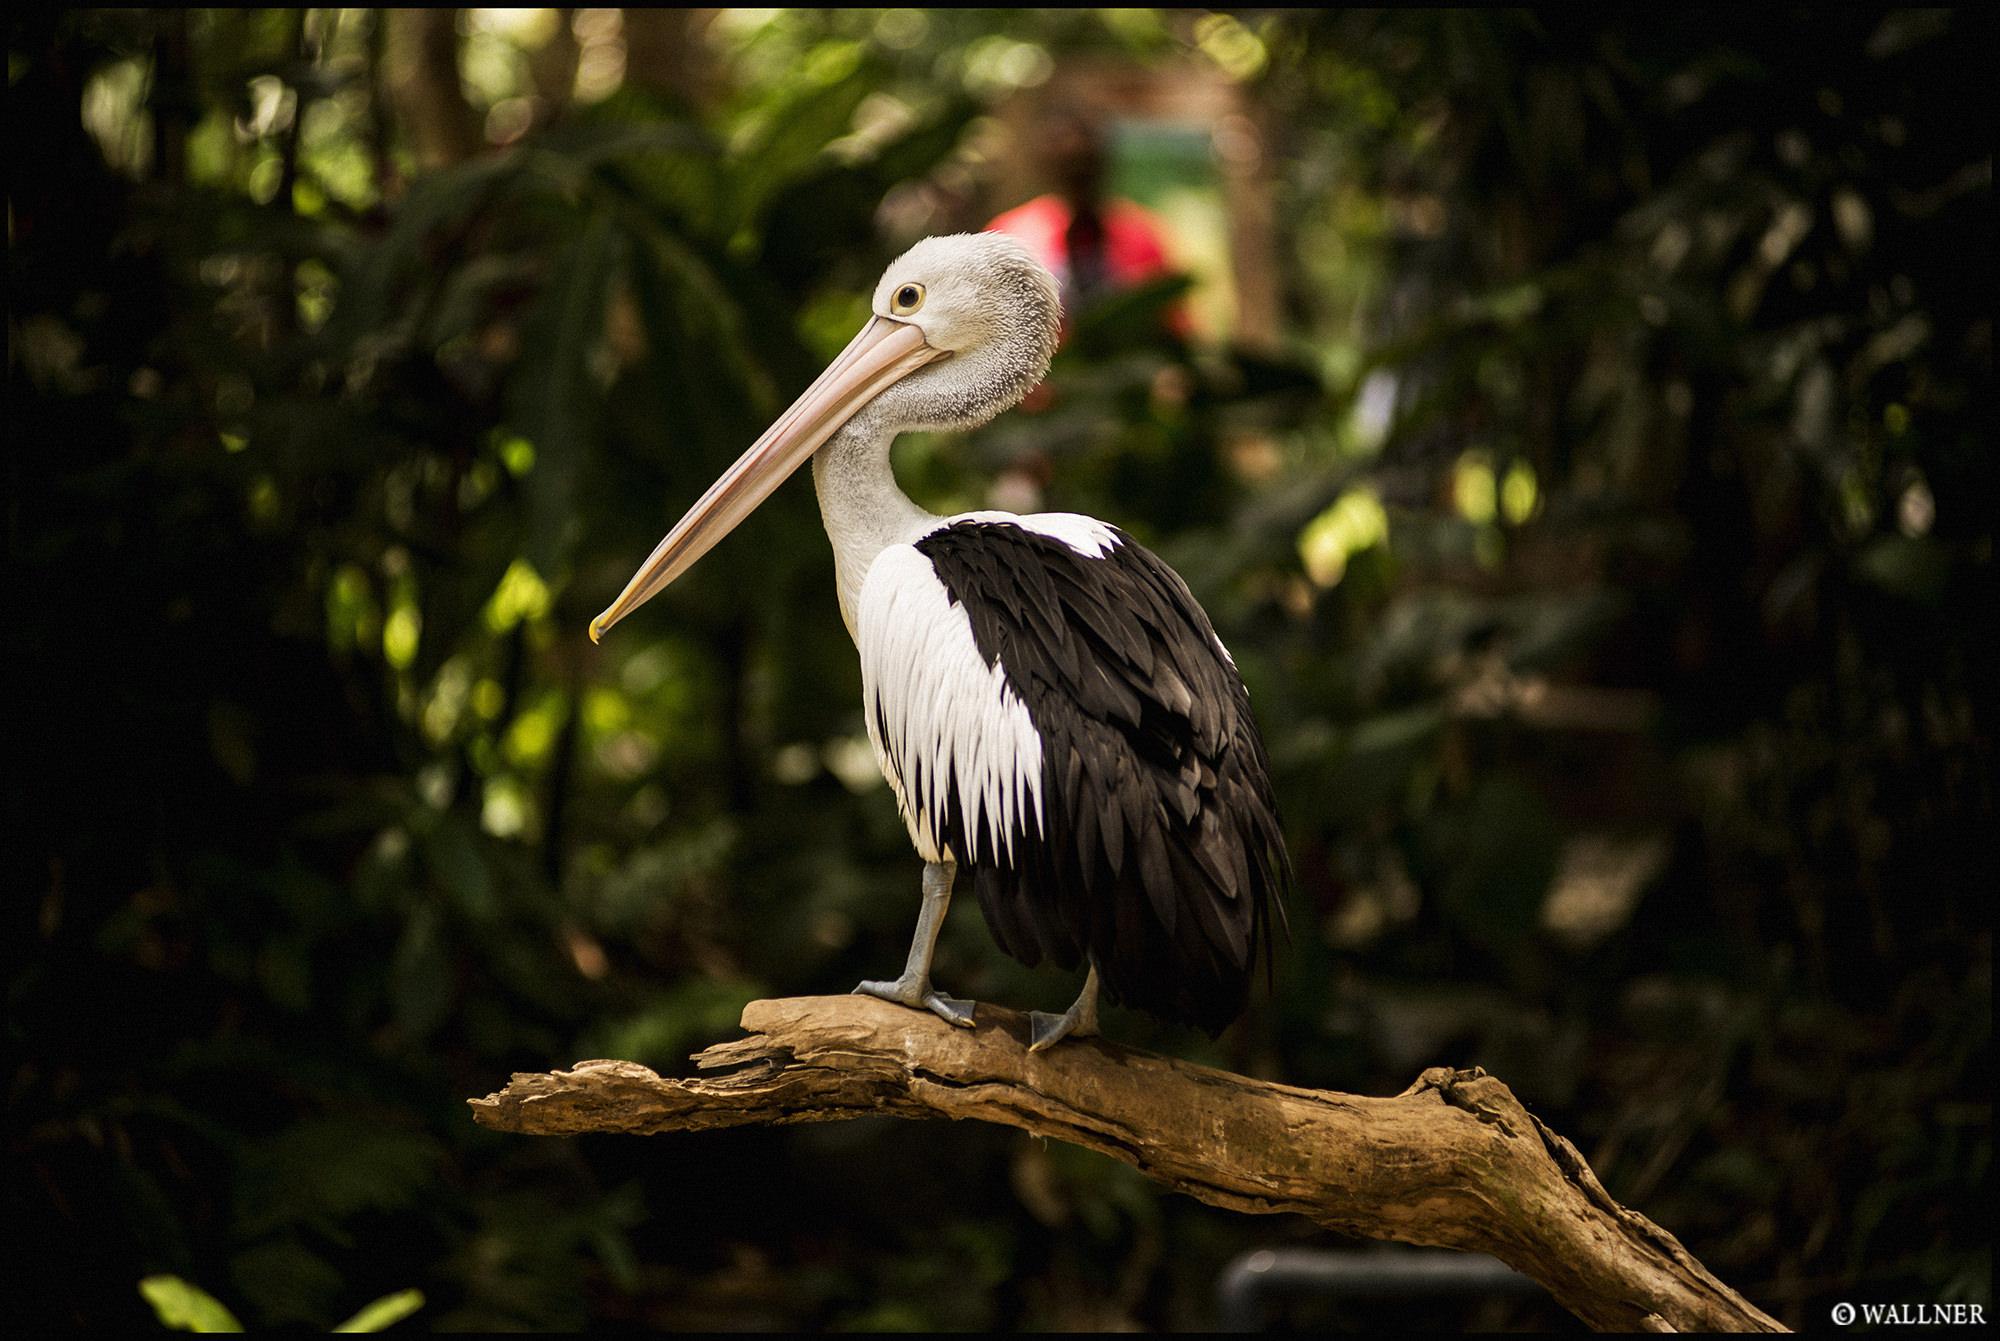 Digital Patrik Wallner Bali Pelican LOWQ 2000P w WM